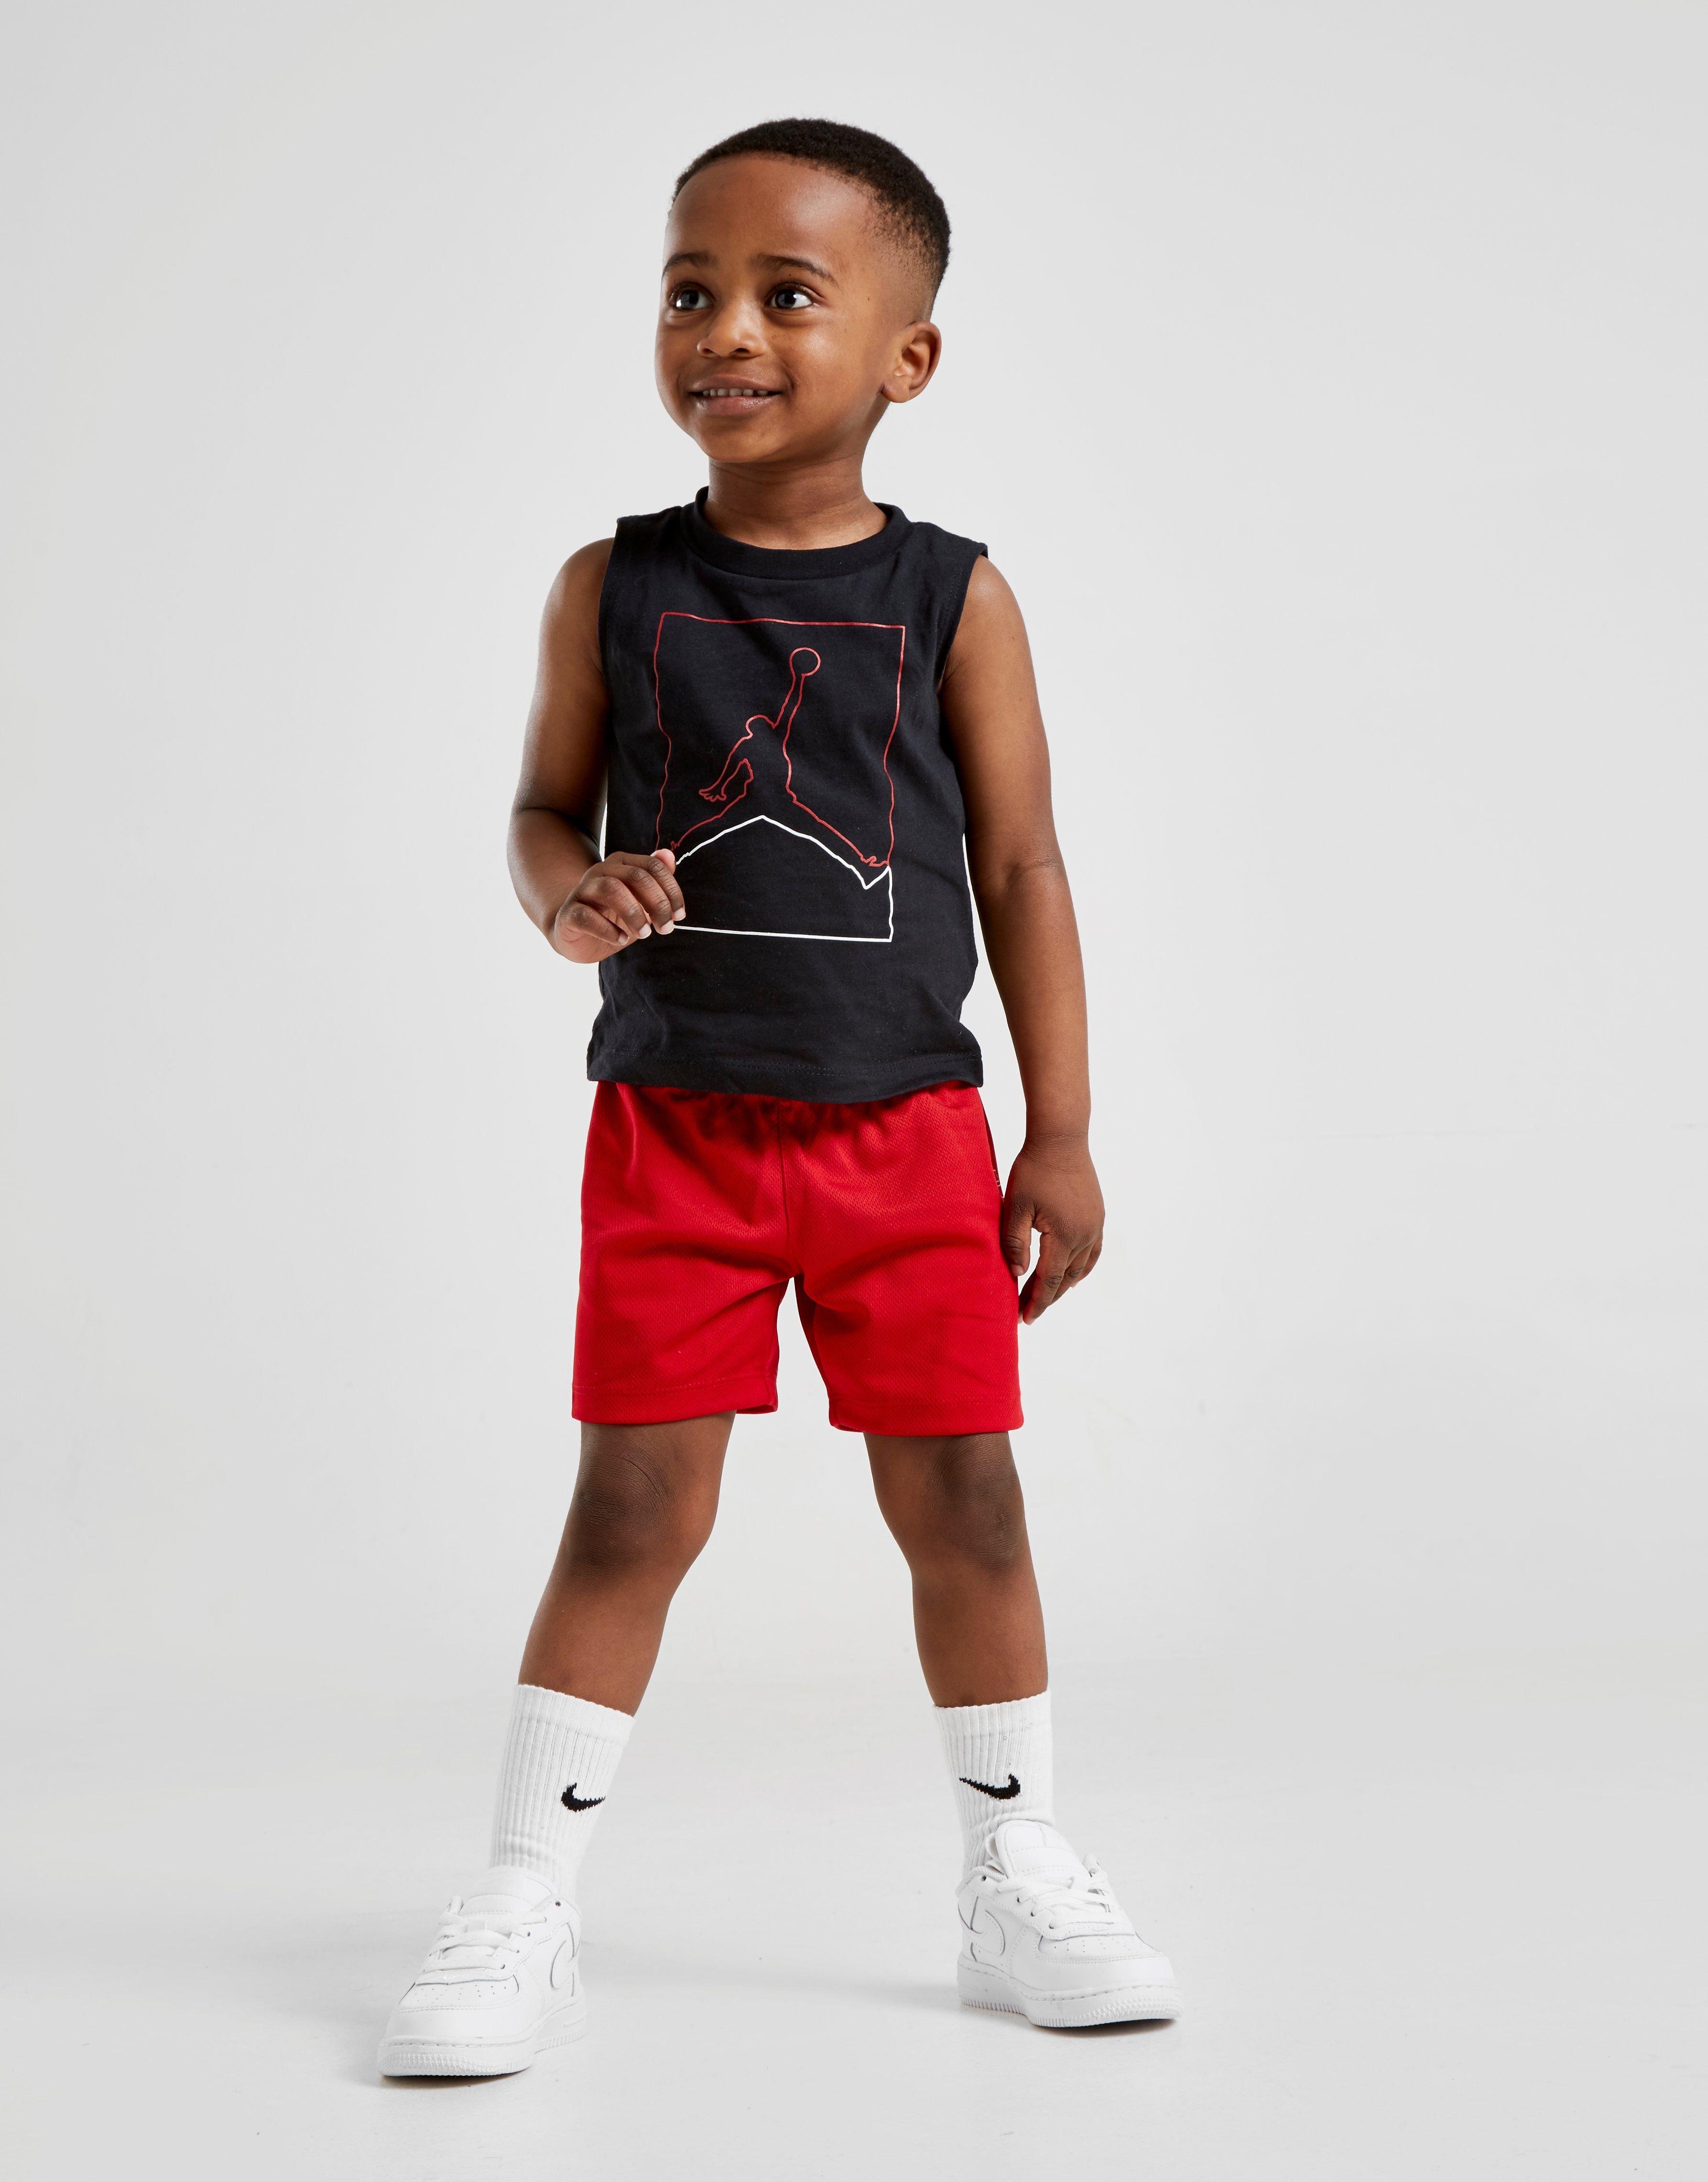 5668d7dcec3 Jordan Light Up Tank Top Short Set Infant